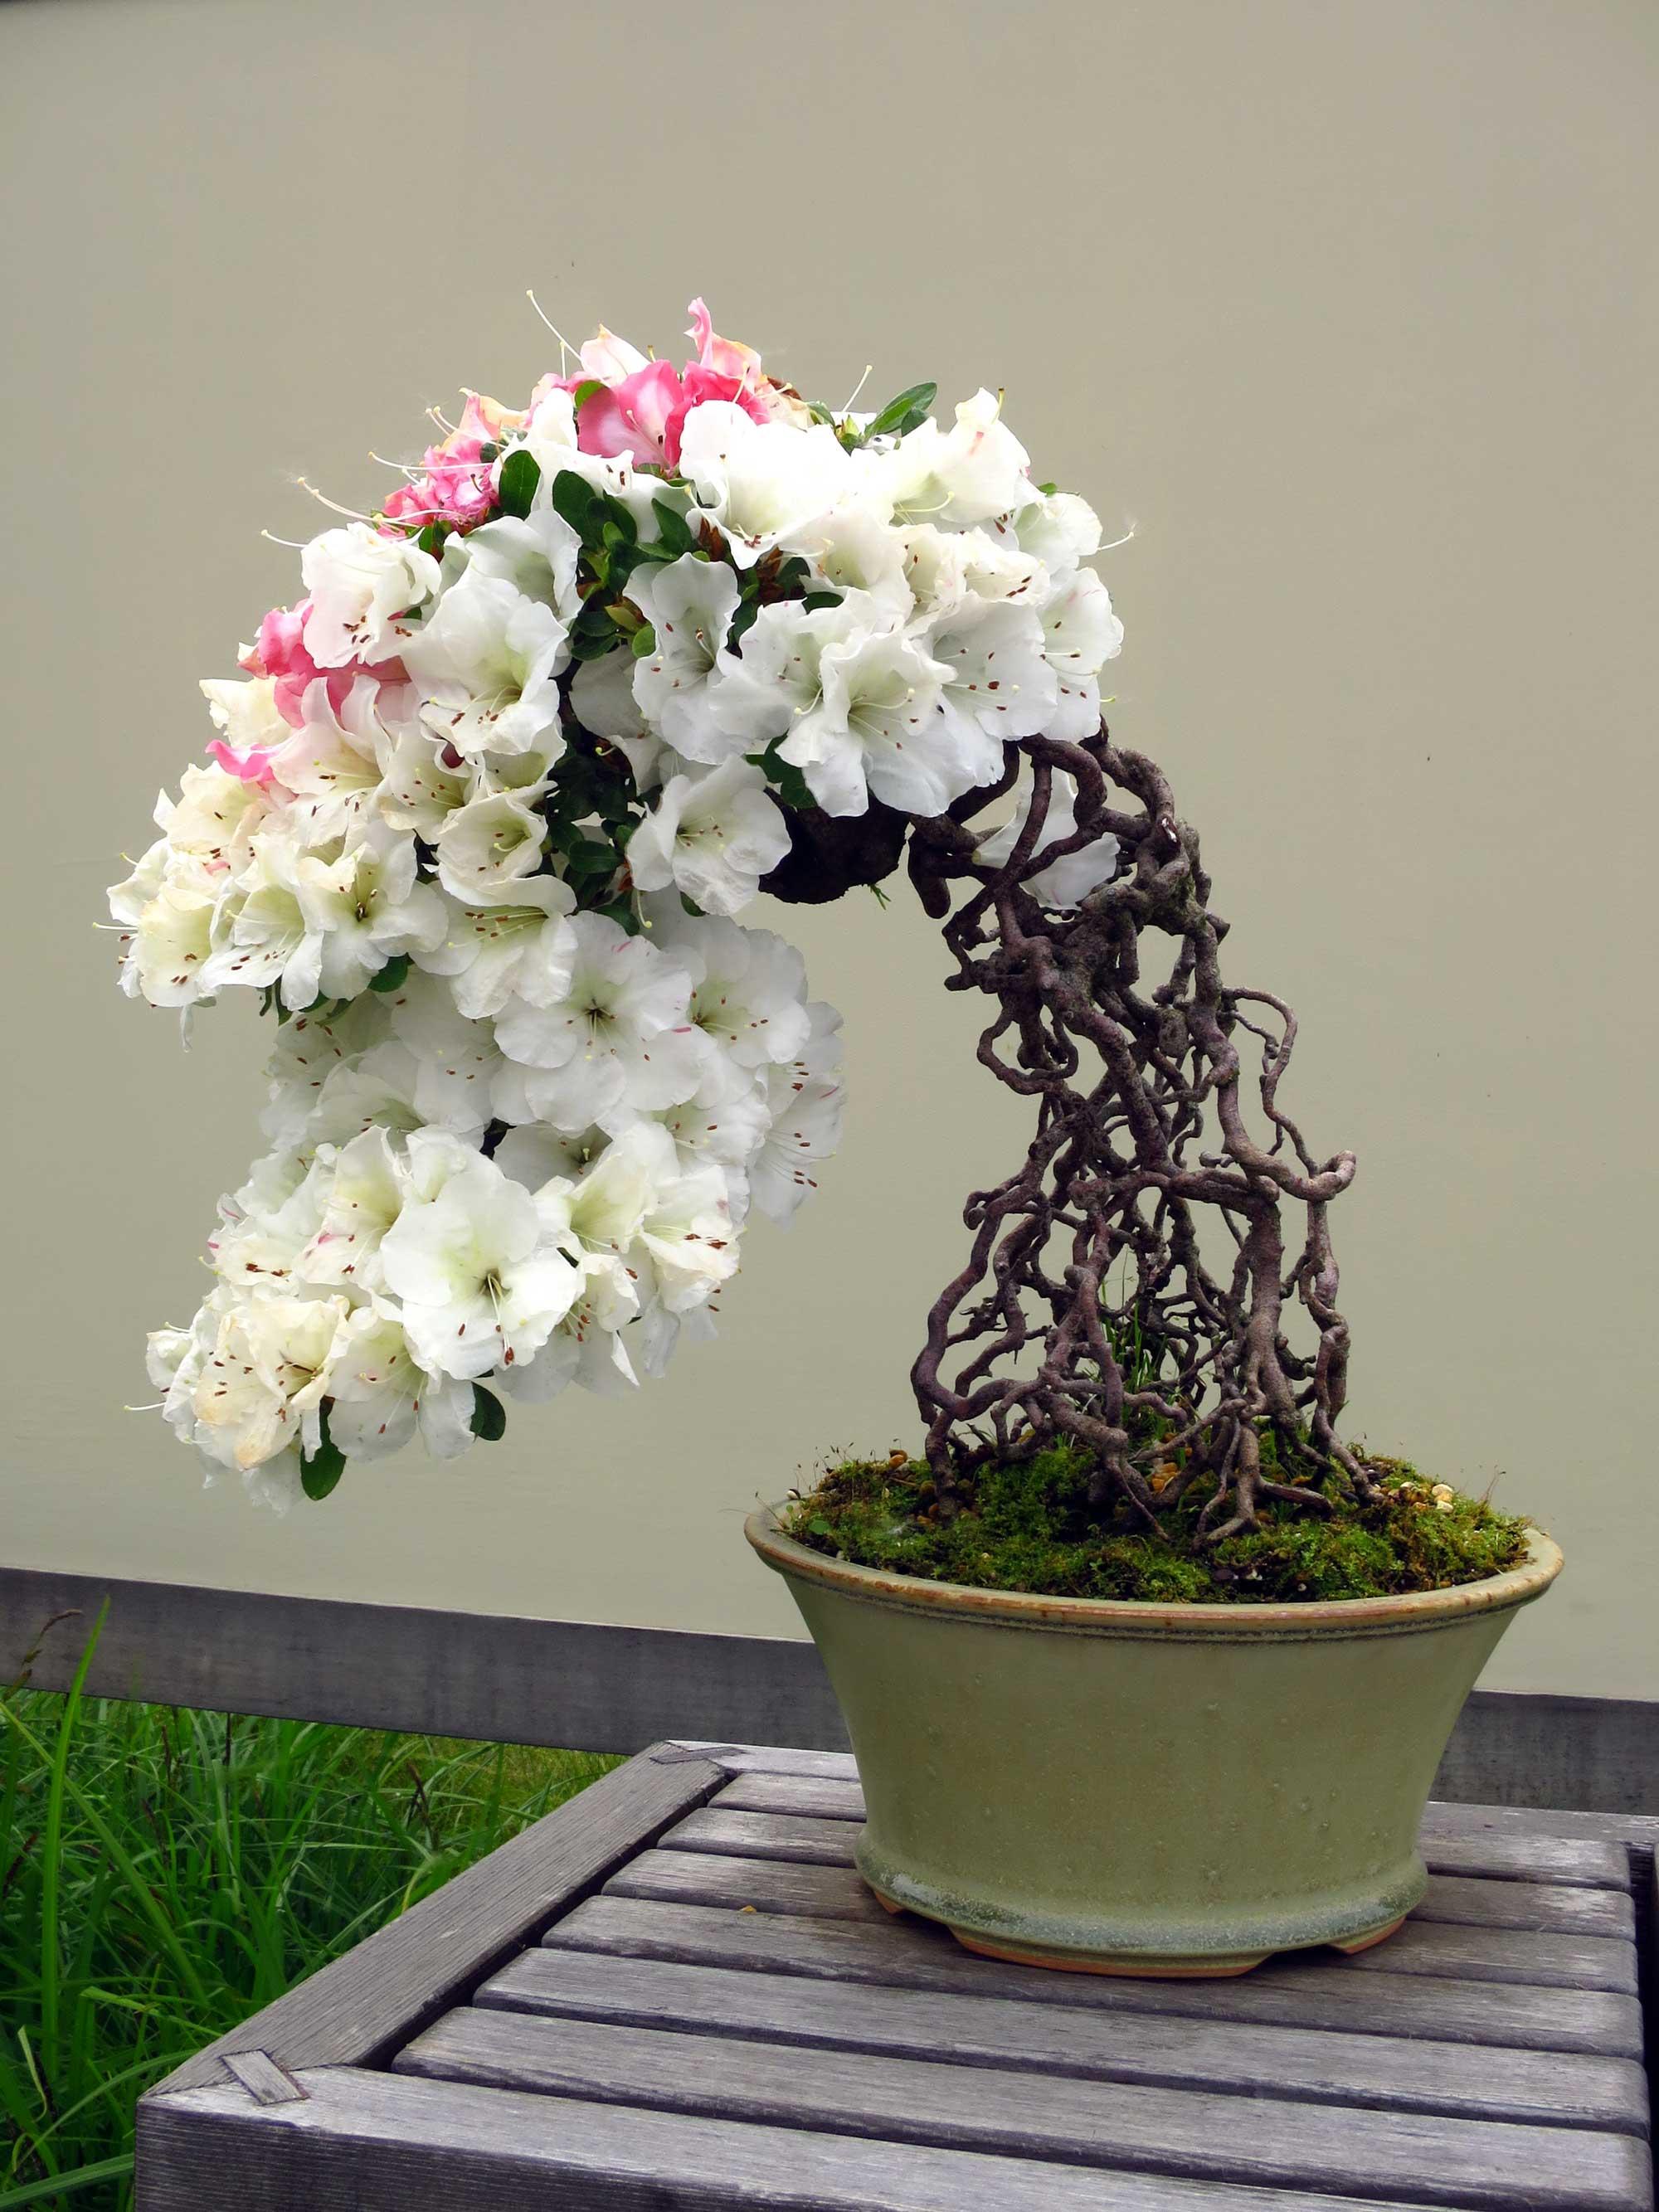 Azalea bonsai from Mel Goldstein's private collection. Image credit: Michele Yanga, Courtesy U-M Matthaei Botanical Gardens